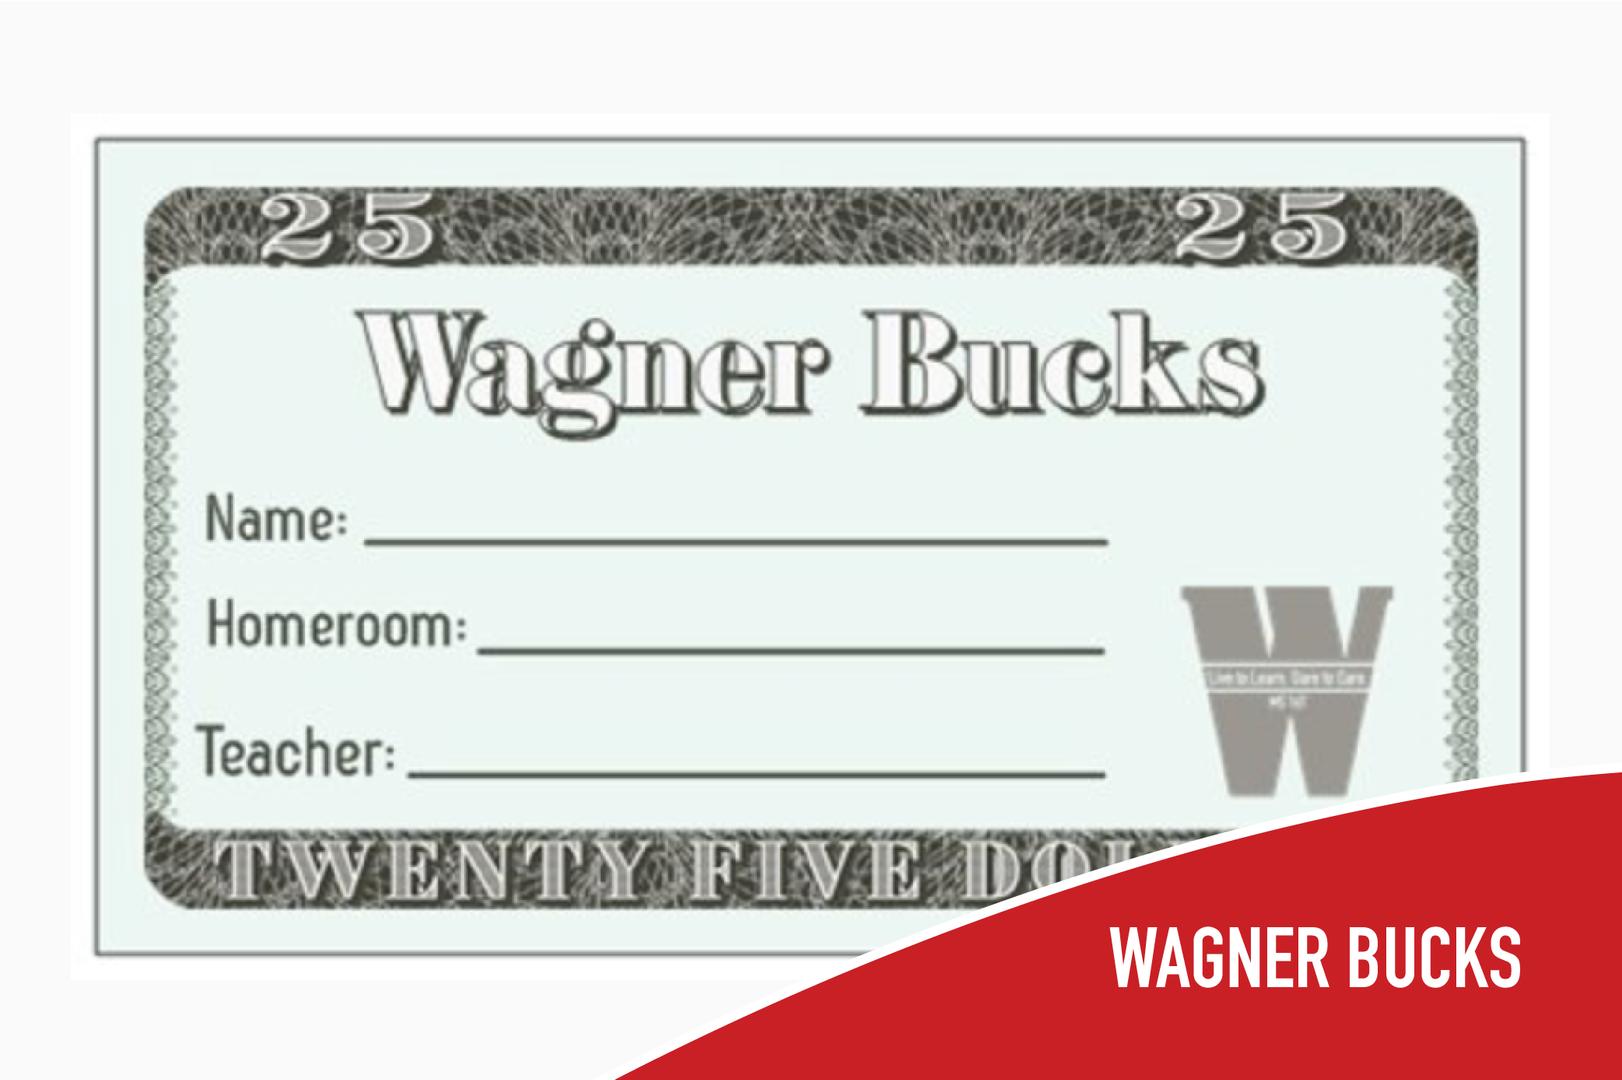 Wagner Bucks